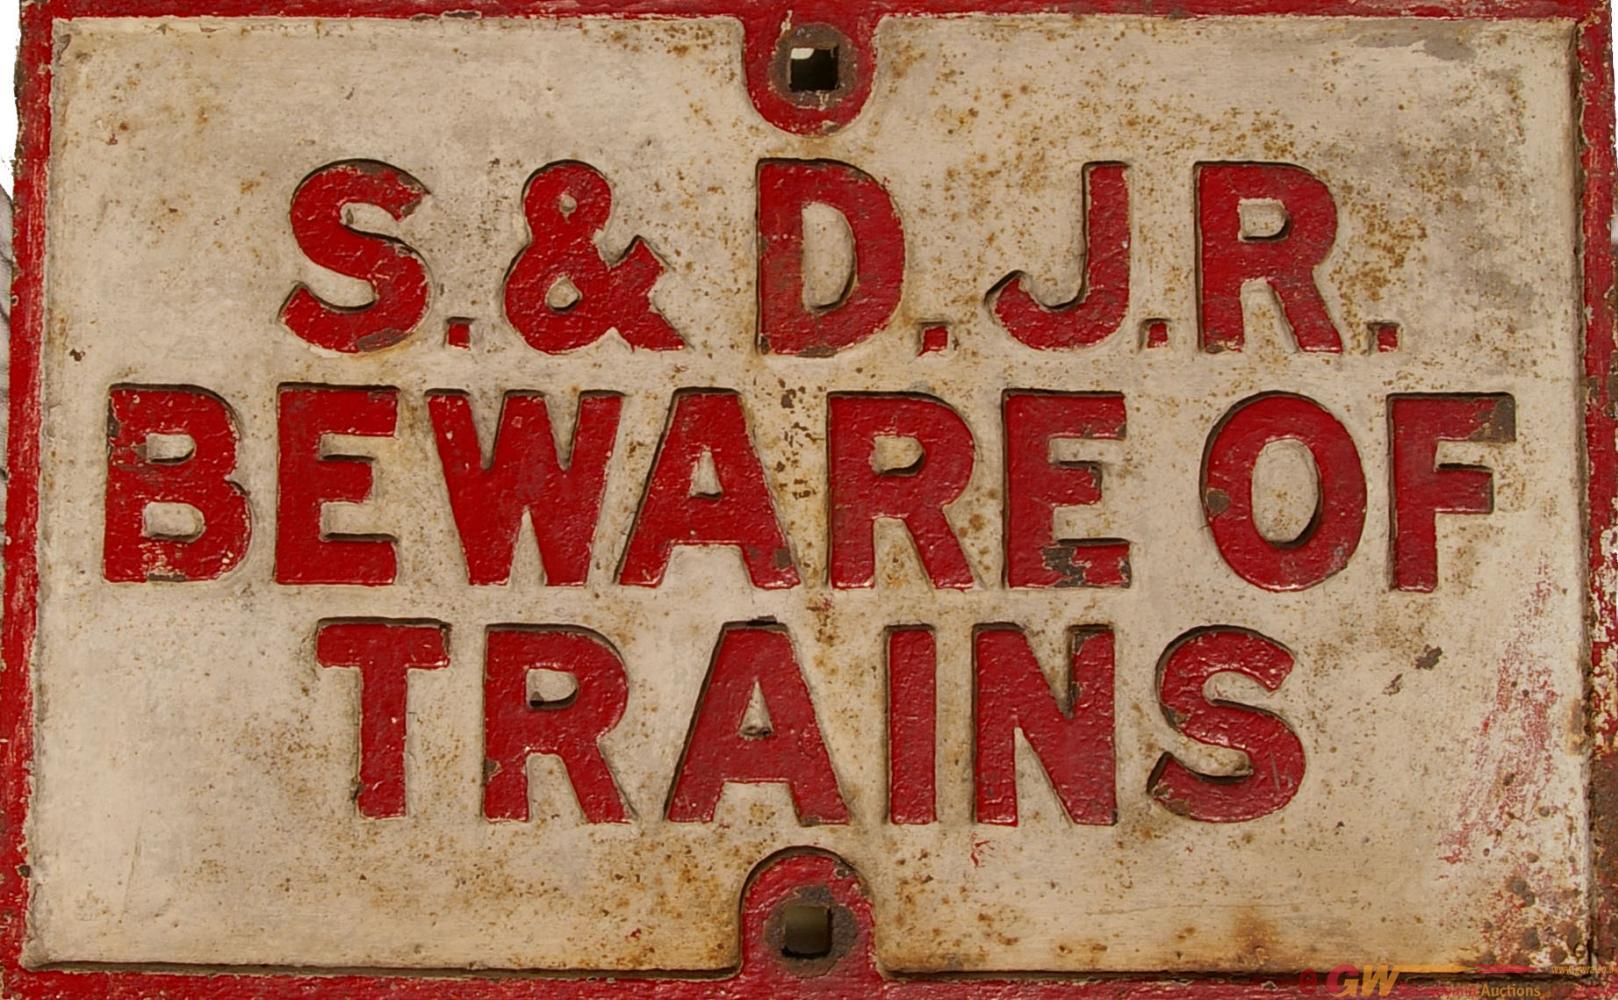 Somerset & Dorset C/I Beware Of Trains Notice.